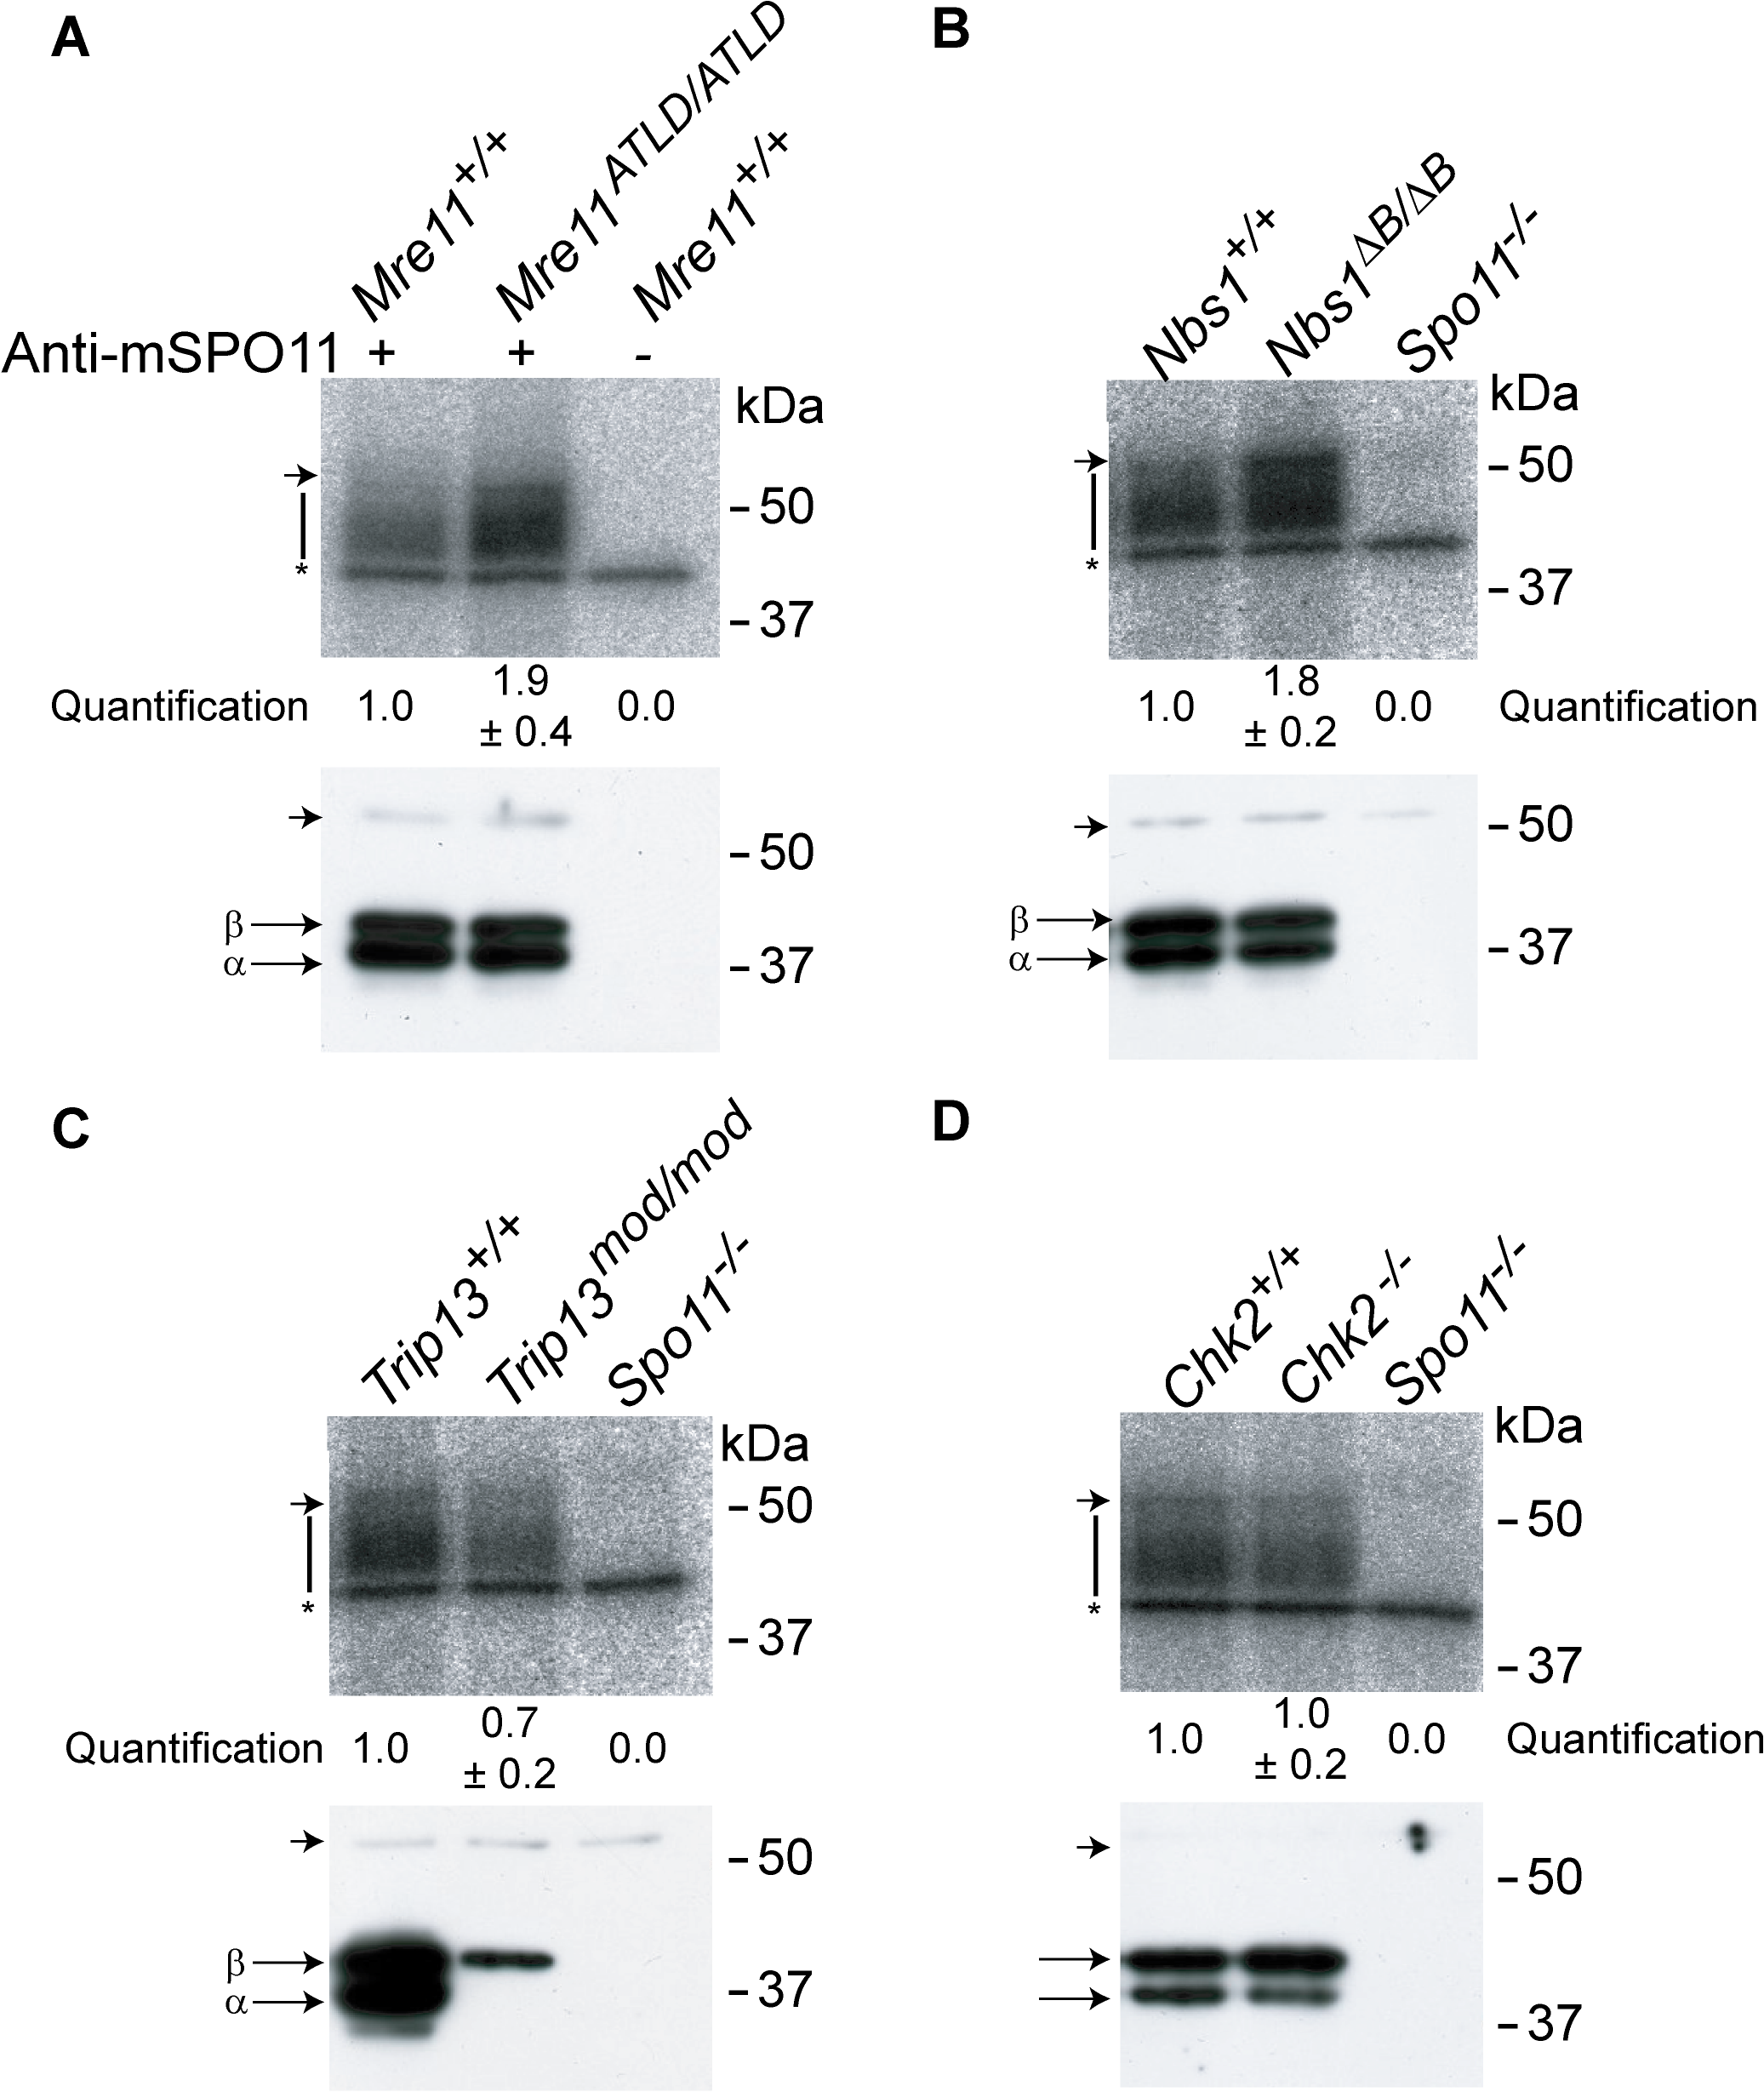 The MRE11 complex, but not TRIP13 or CHK2, modulates SPO11-oligonucleotide complex levels.